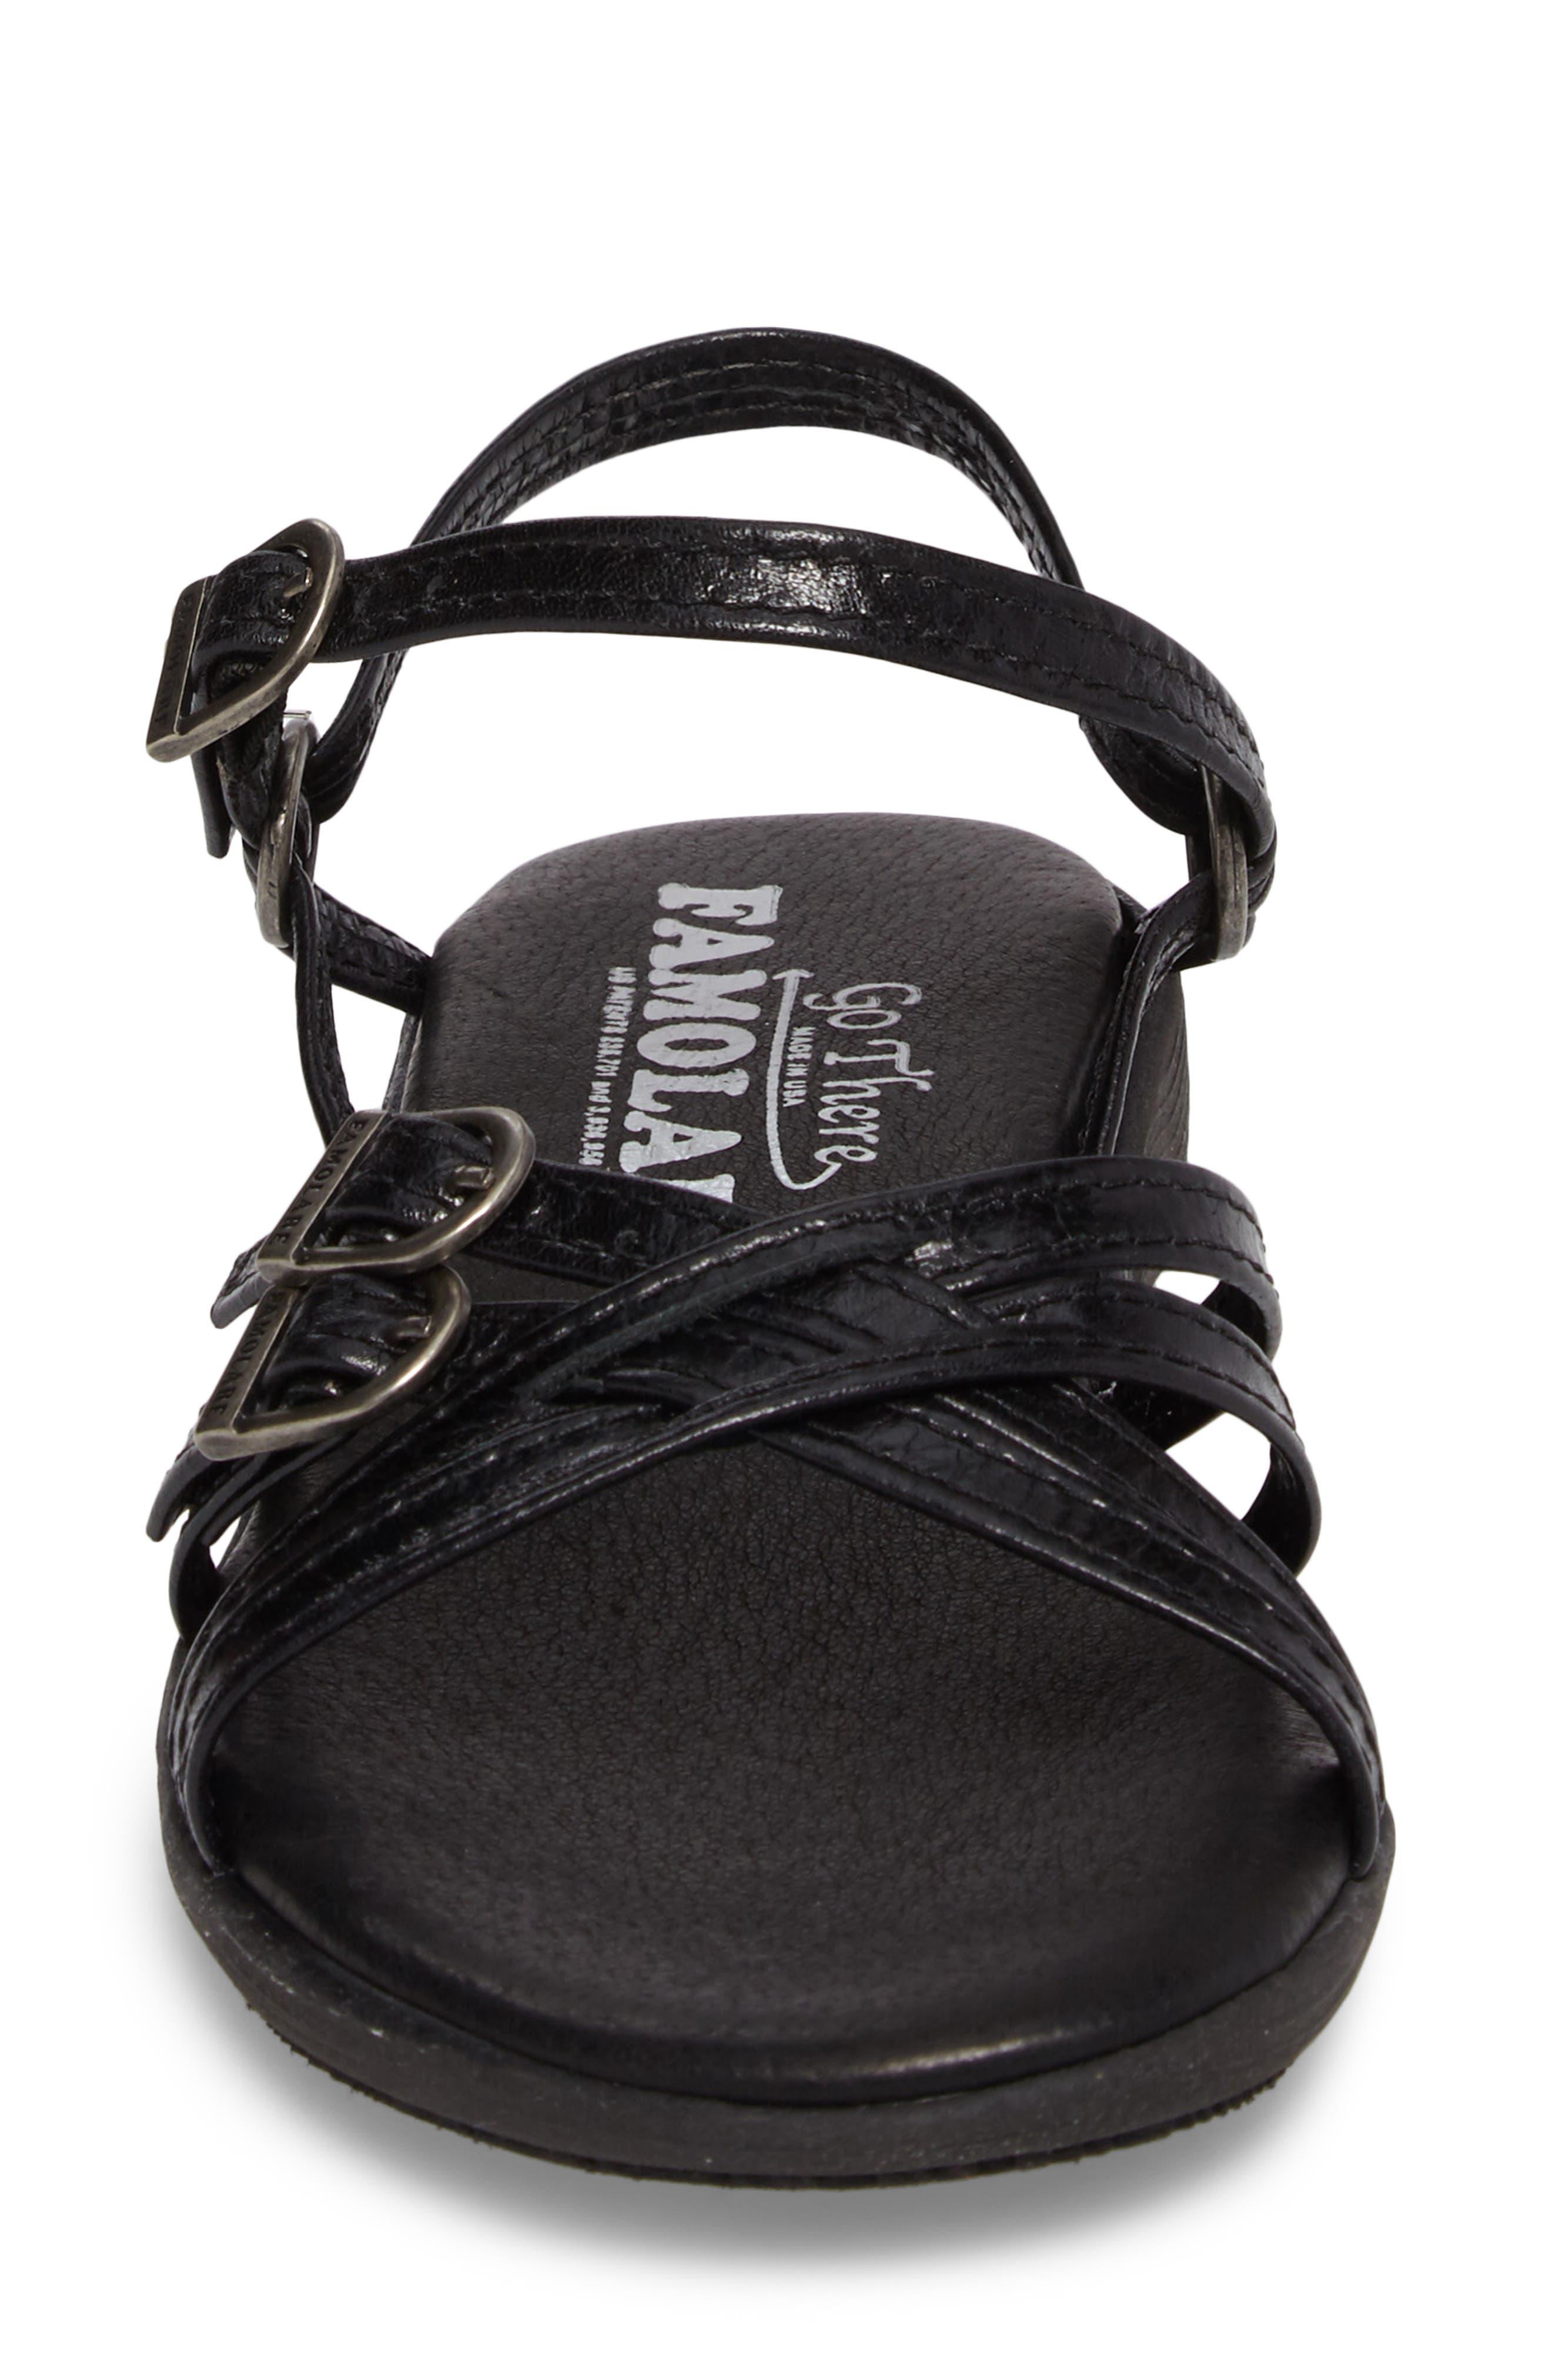 Strapsody Buckle Sandal,                             Alternate thumbnail 5, color,                             Coal Leather